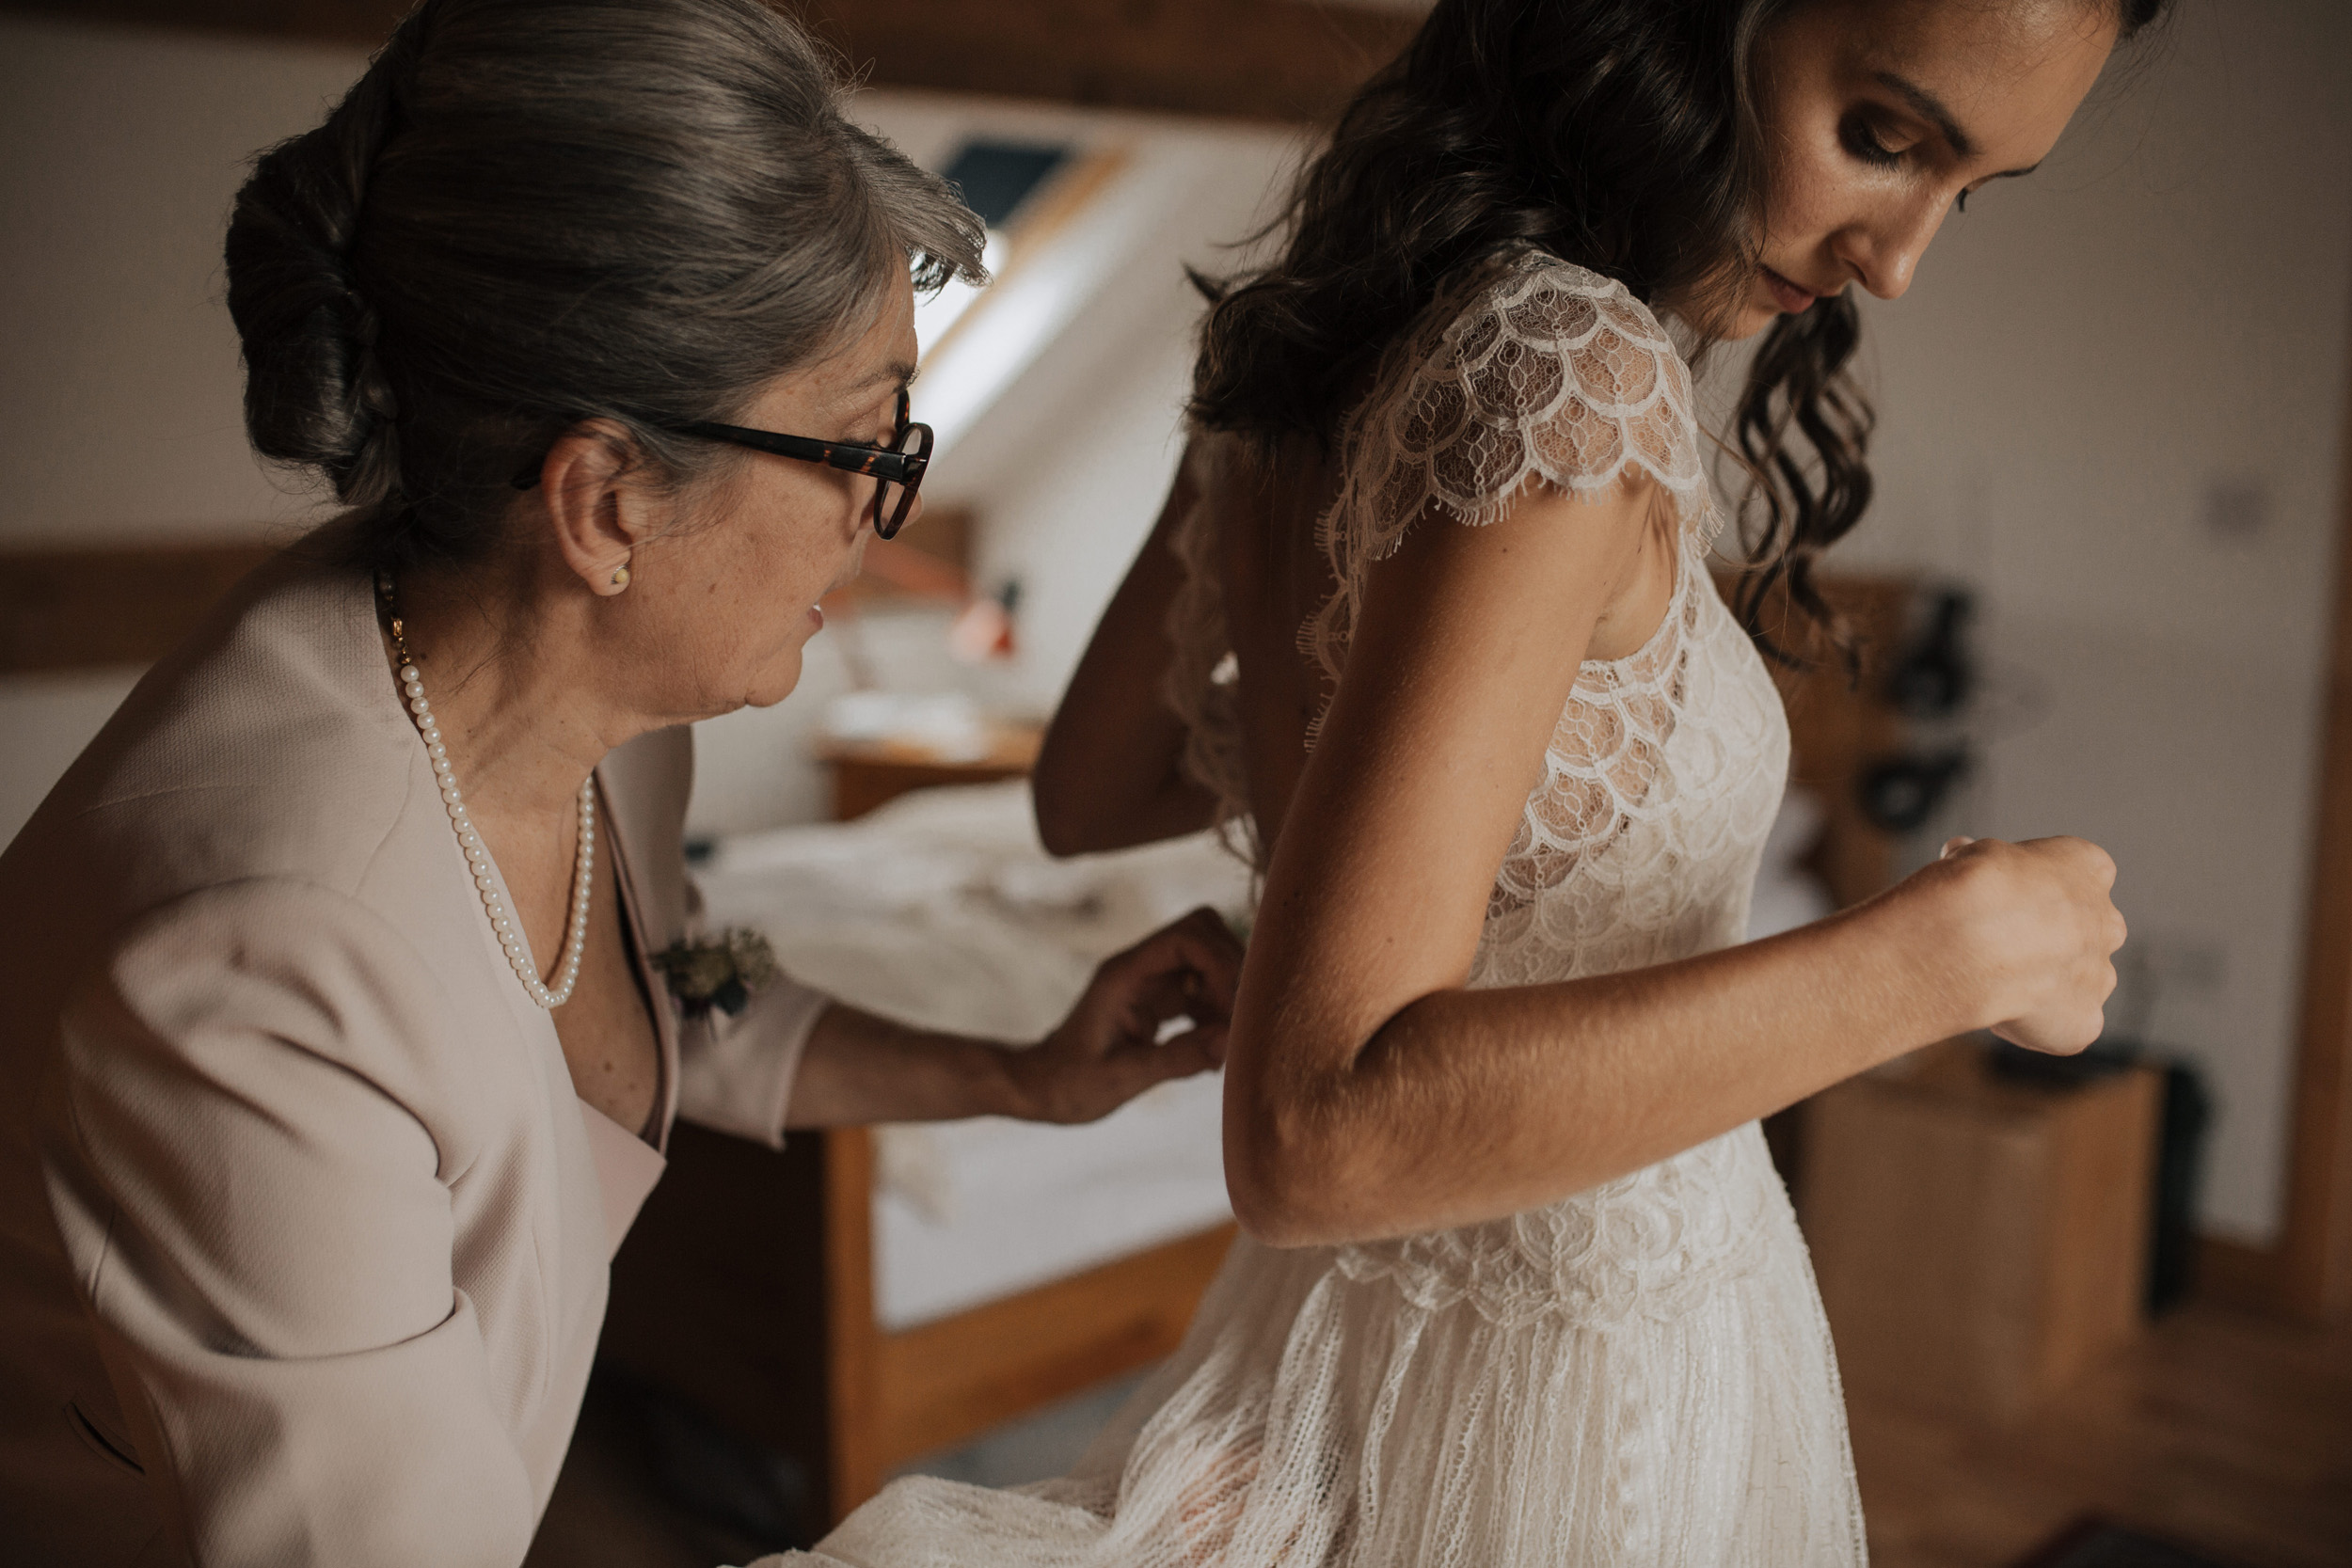 Joasia-Kate-Beaumont-Bohemian-Lace-Wedding-Dress-Peak-District-Sheffield-Wedding-1.jpg